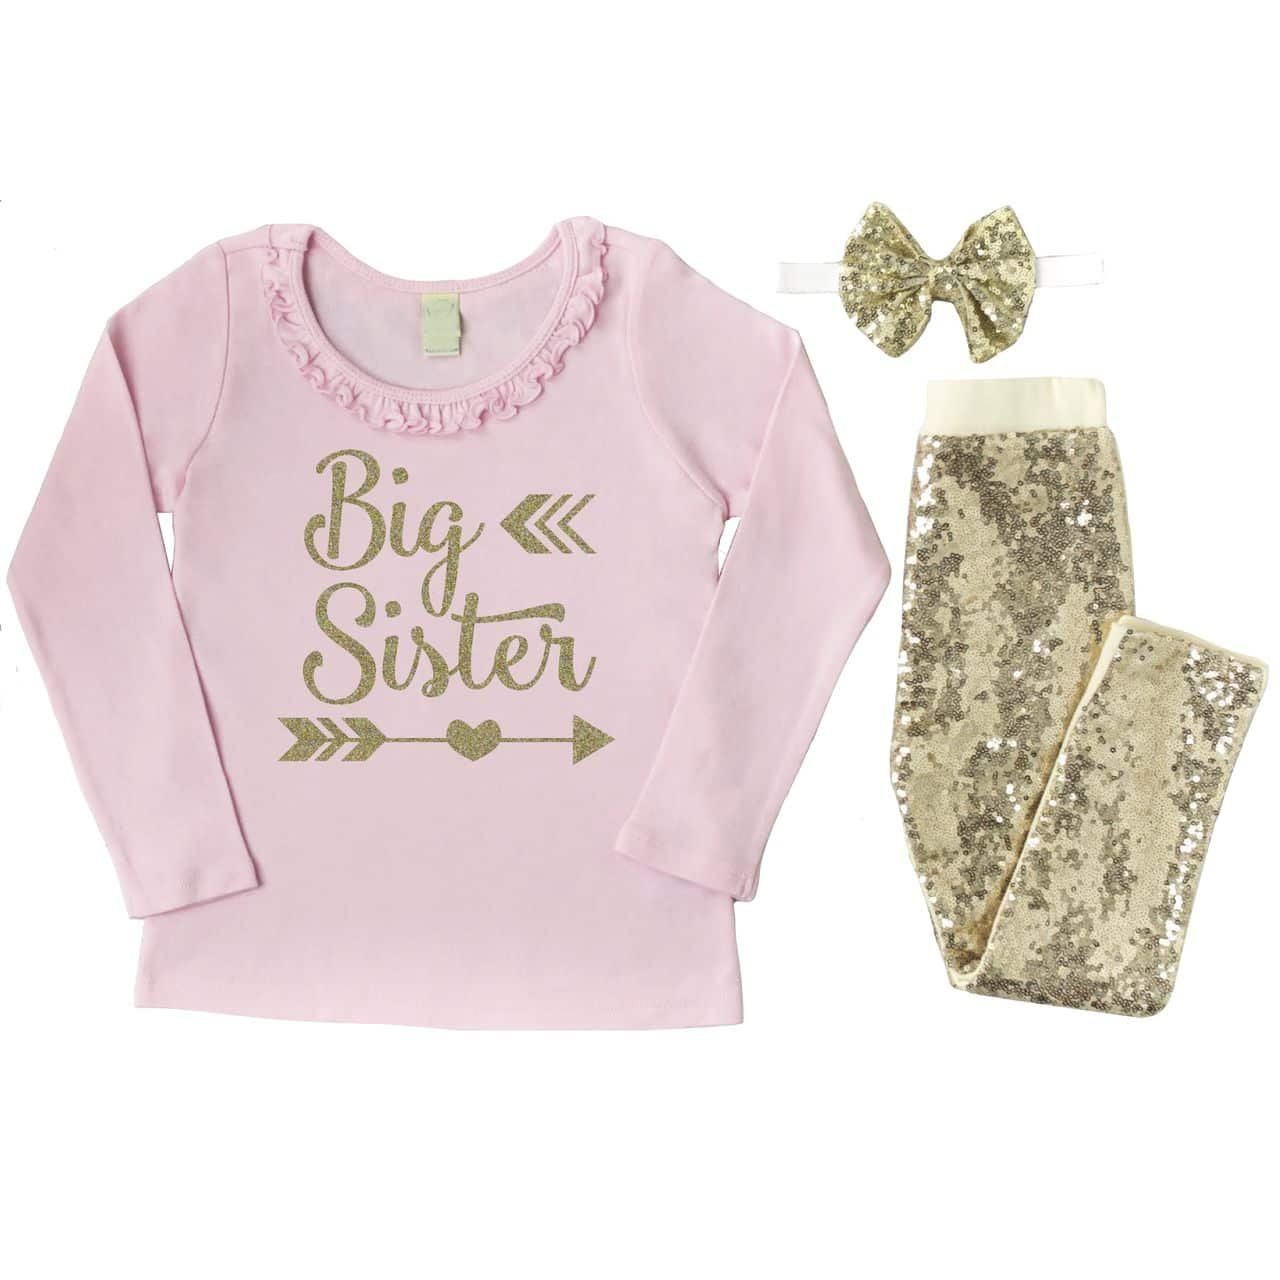 a4c97621e Amazon.com: Big Sister Outfit, Toddler Girl Clothes, Big Sister Shirt Pants  Headband Set: Clothing